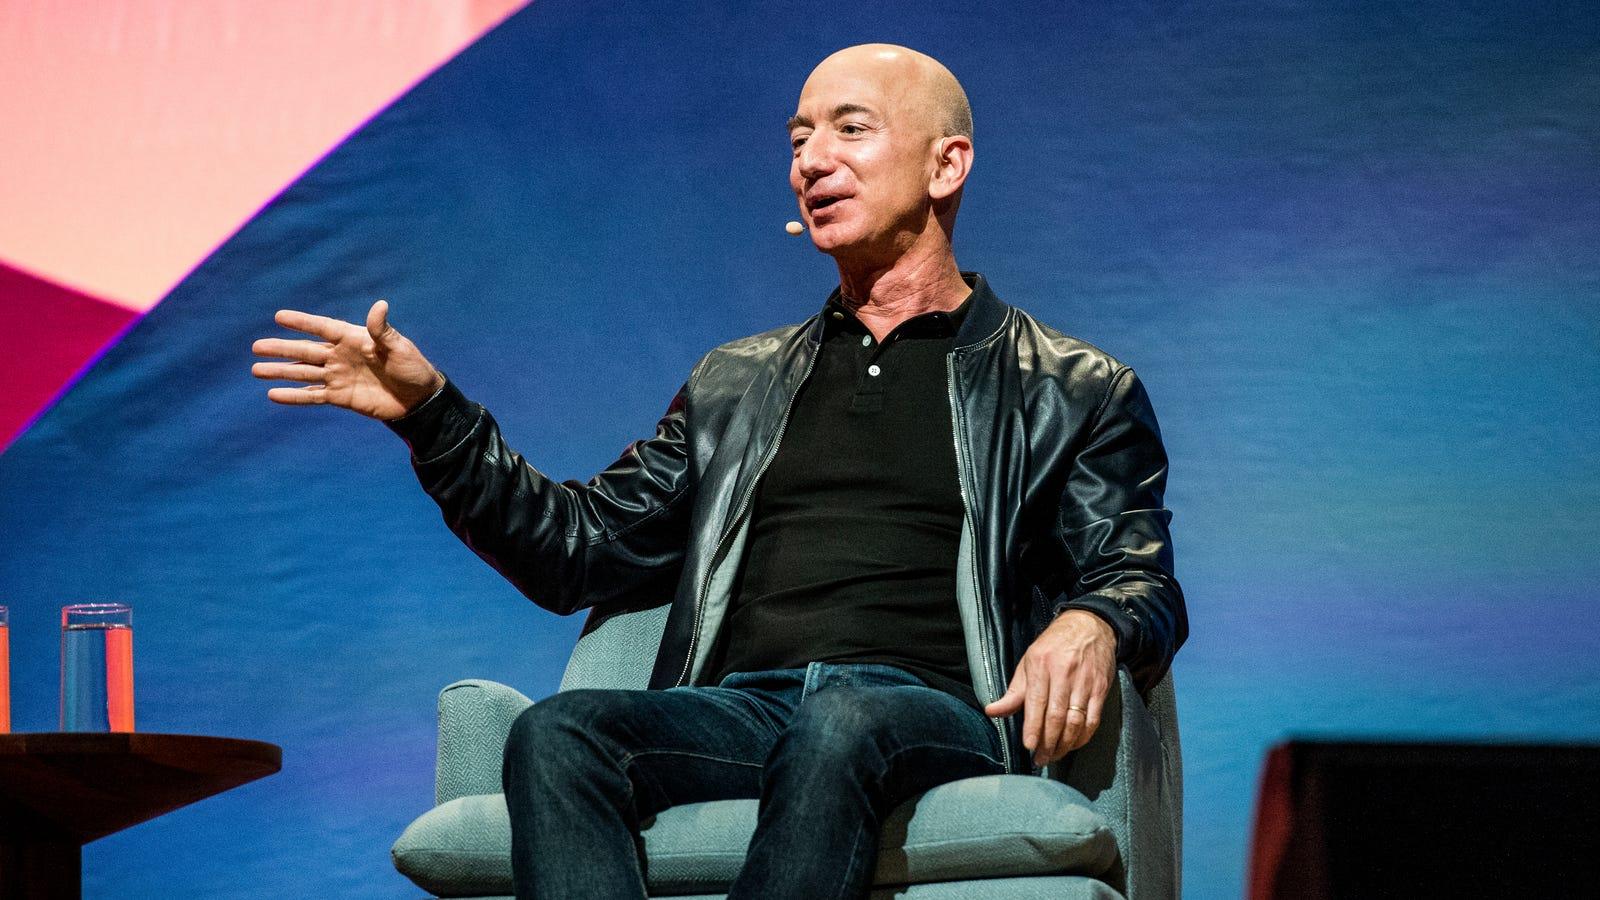 Jeff Bezos Details Plan to Make Blue Origin the Amazon of the Moon